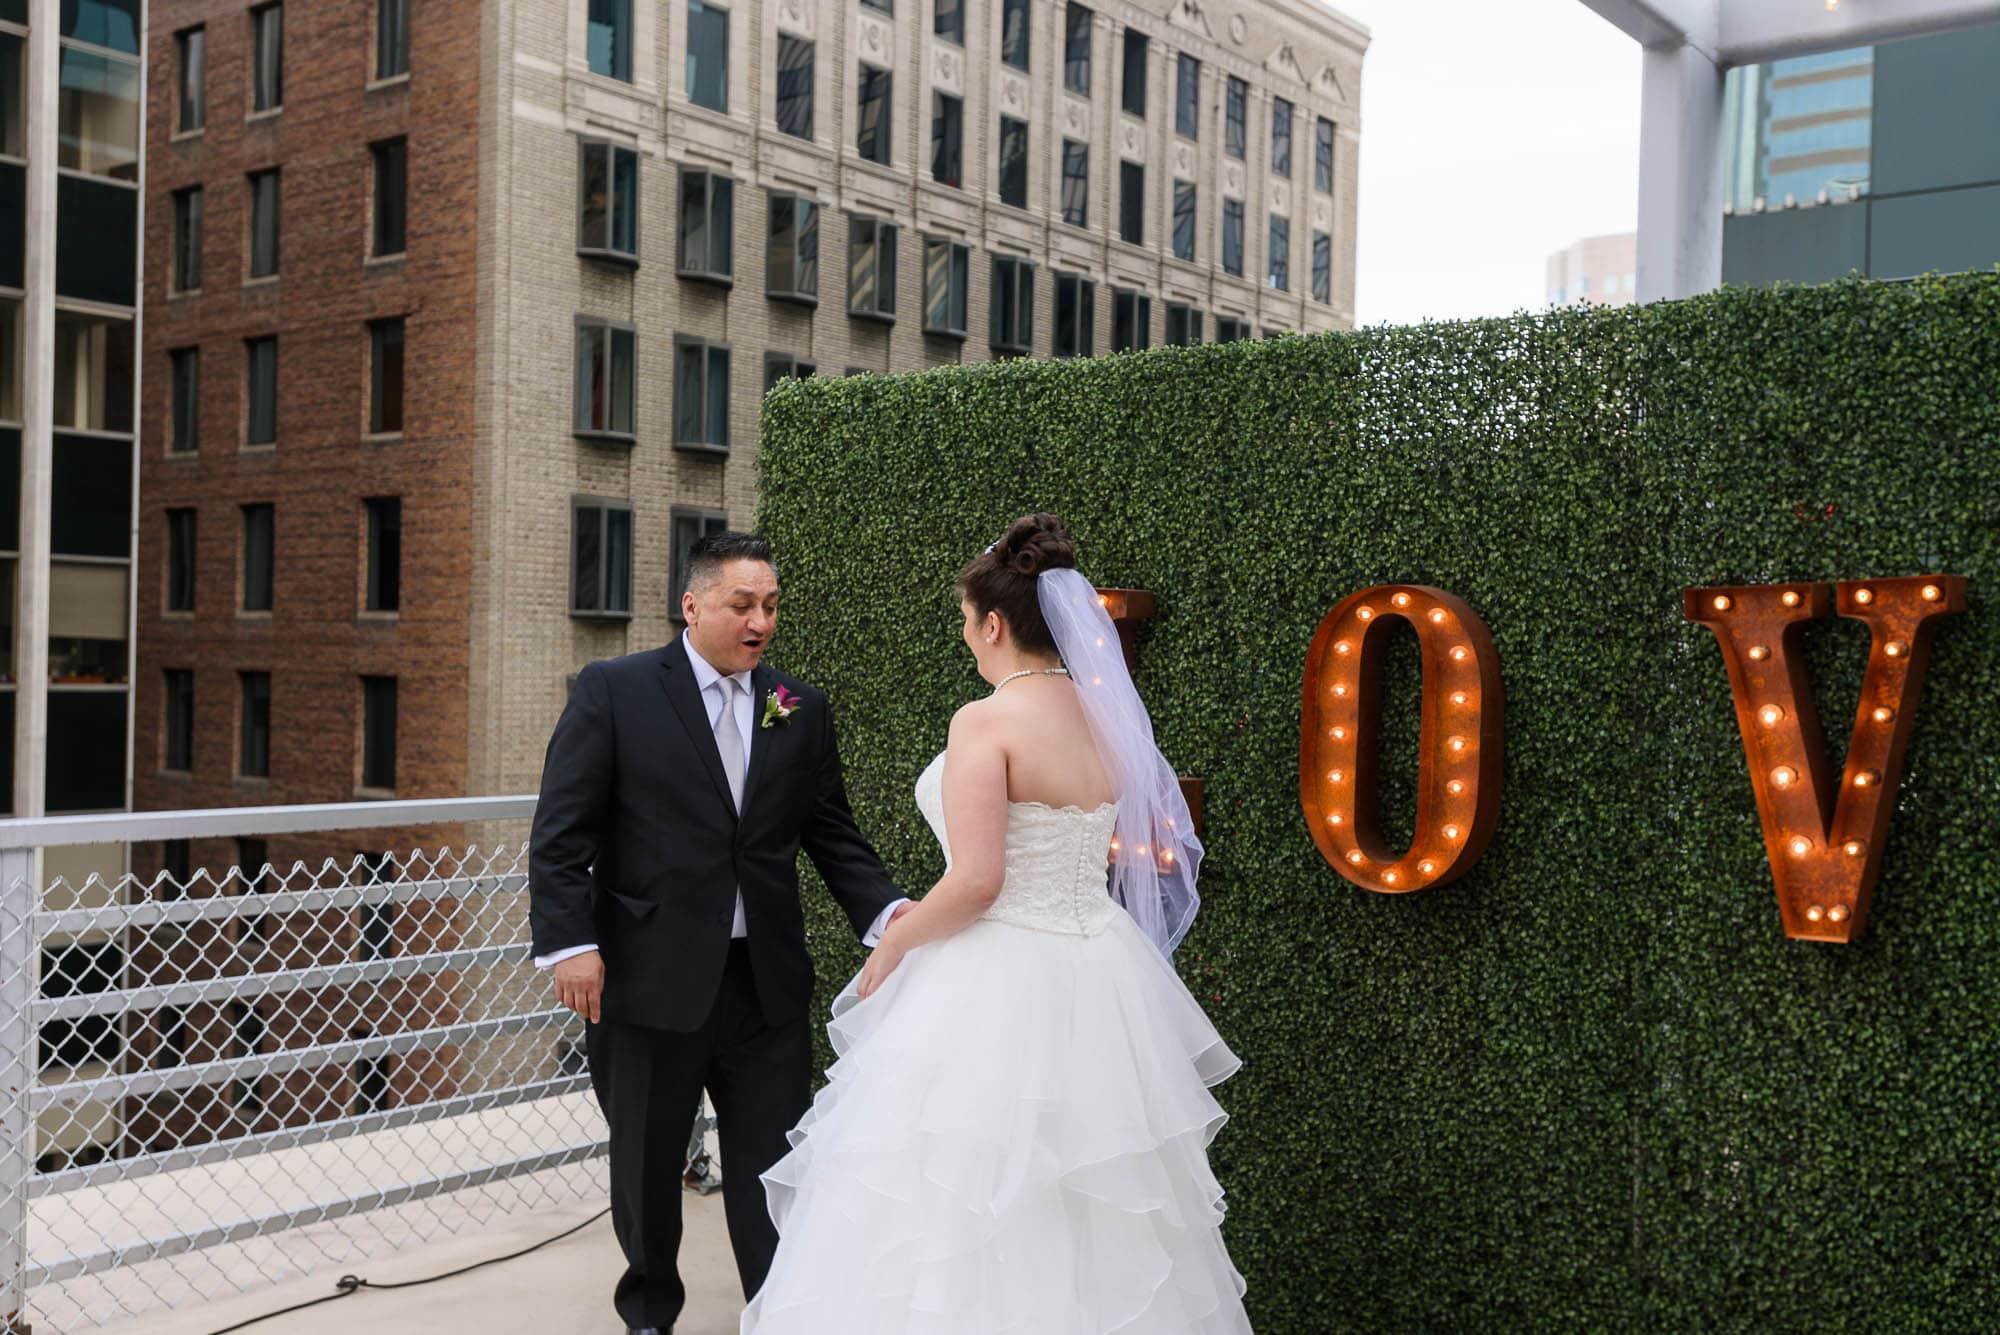 010_Alan_and_Heidi_Wedding_Nicole_Roman